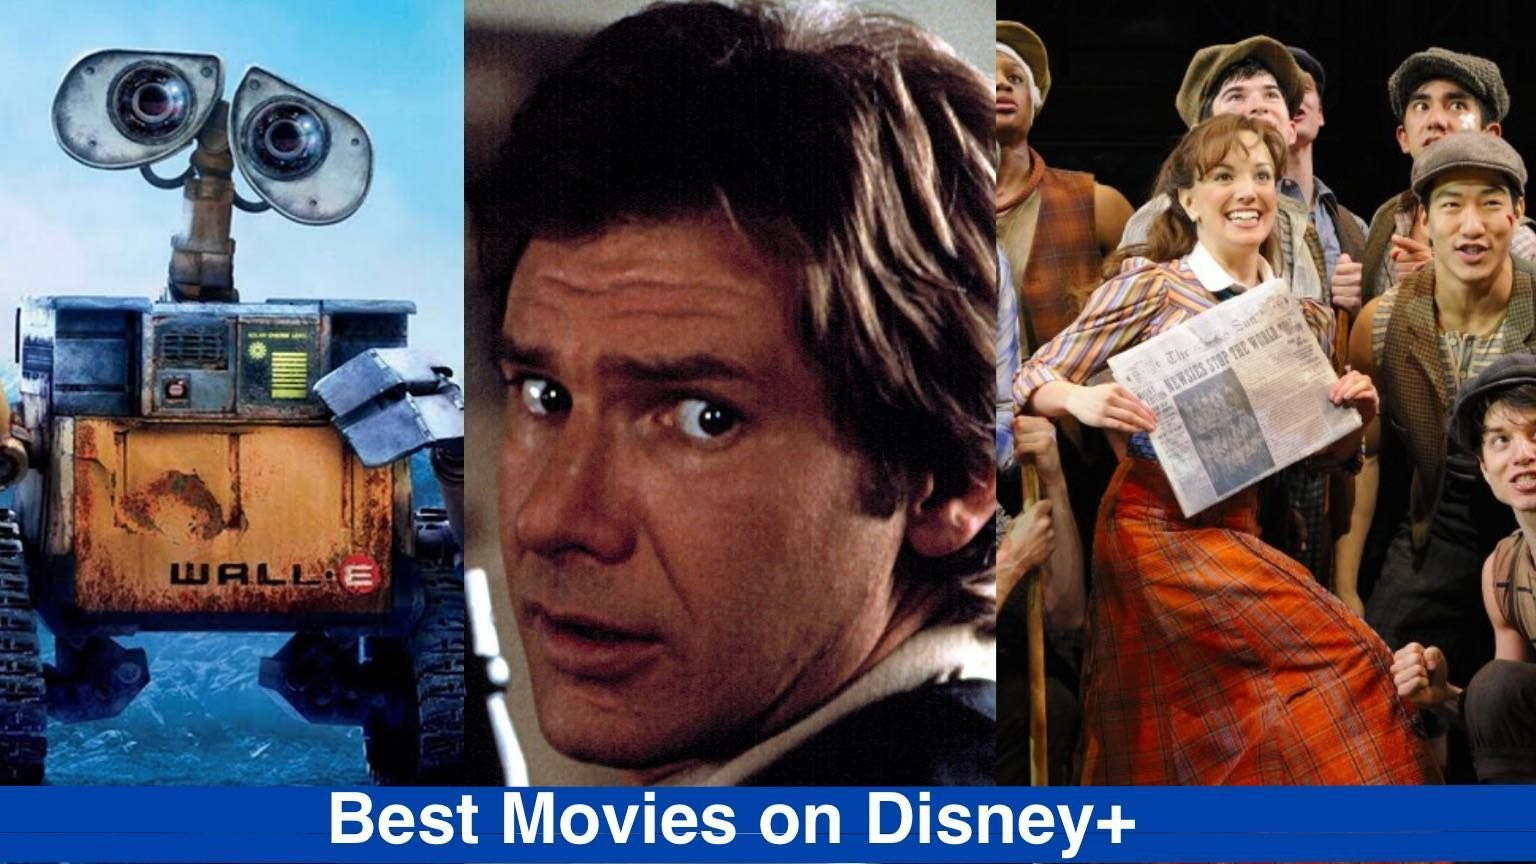 Best movies on Disney+